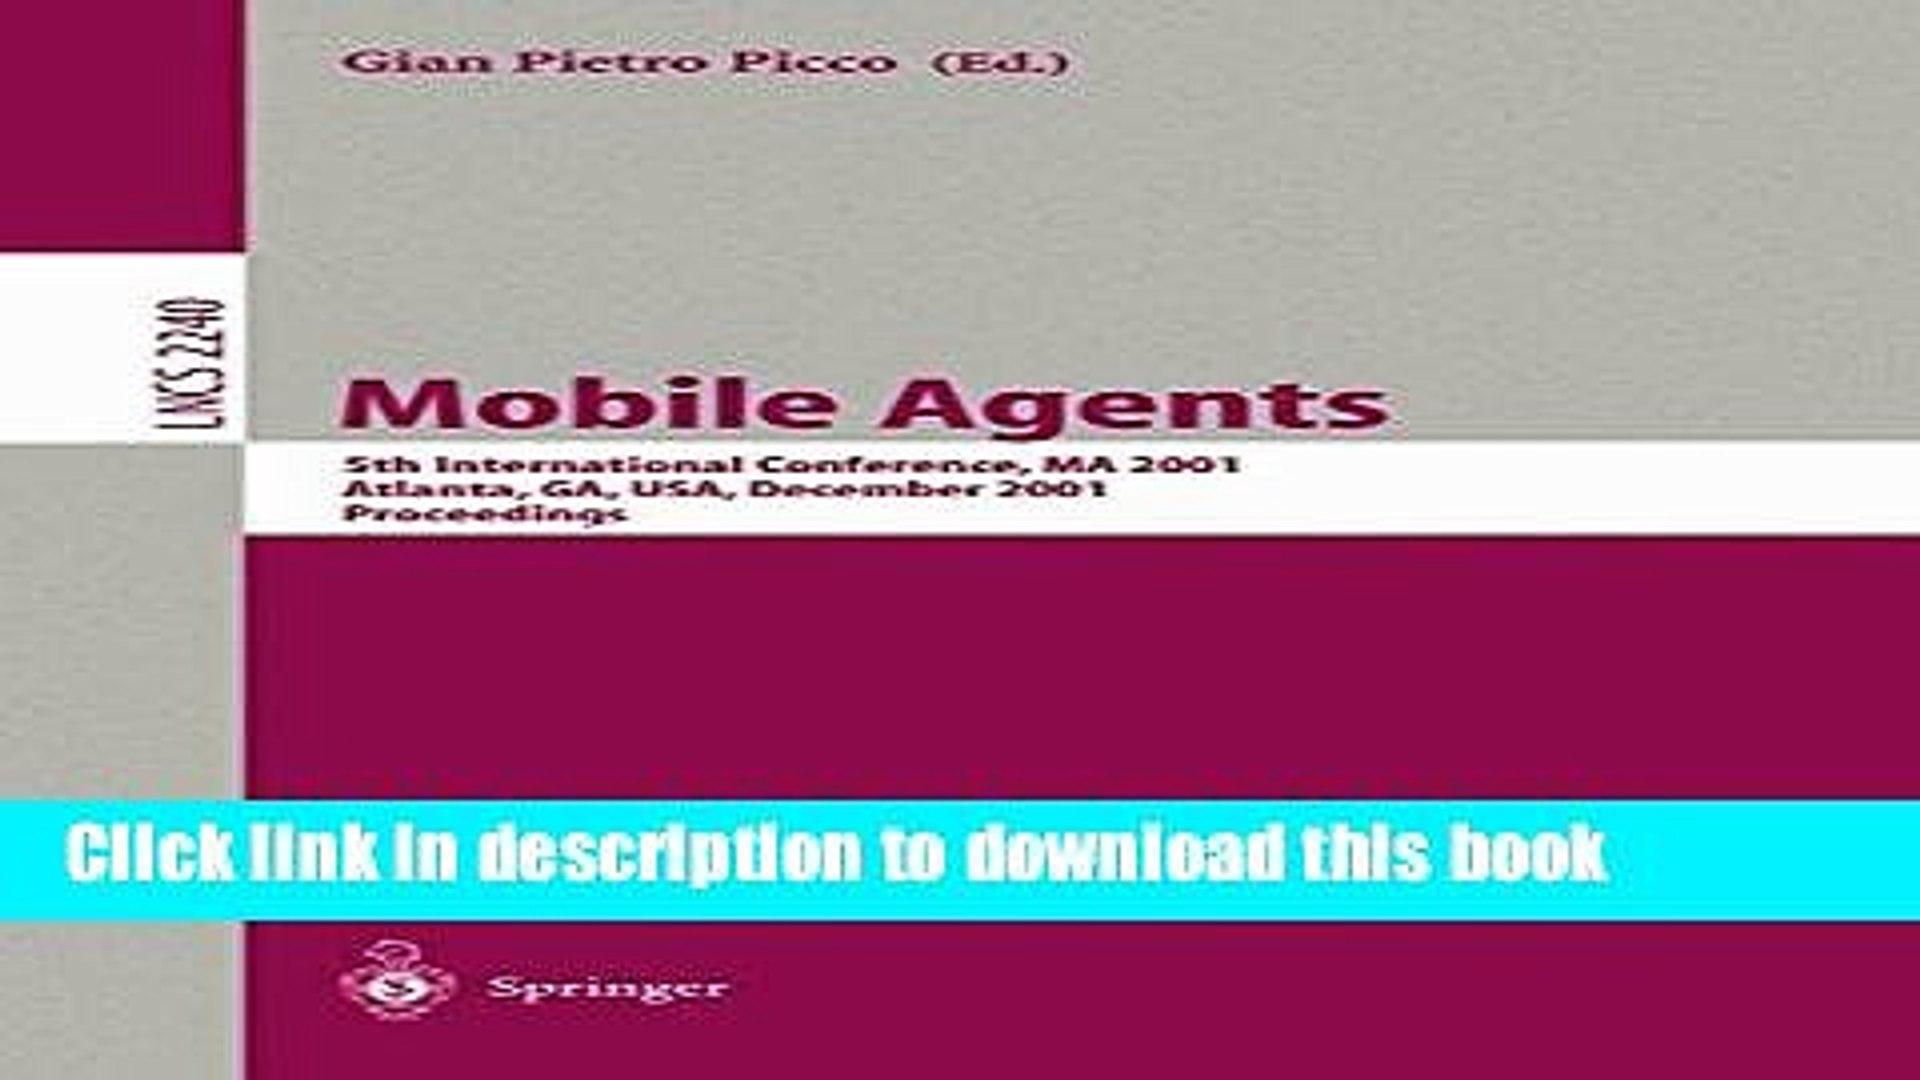 PDF Mobile Agents: 5th International Conference, MA 2001 Atlanta, GA, USA, December 2-4, 2001